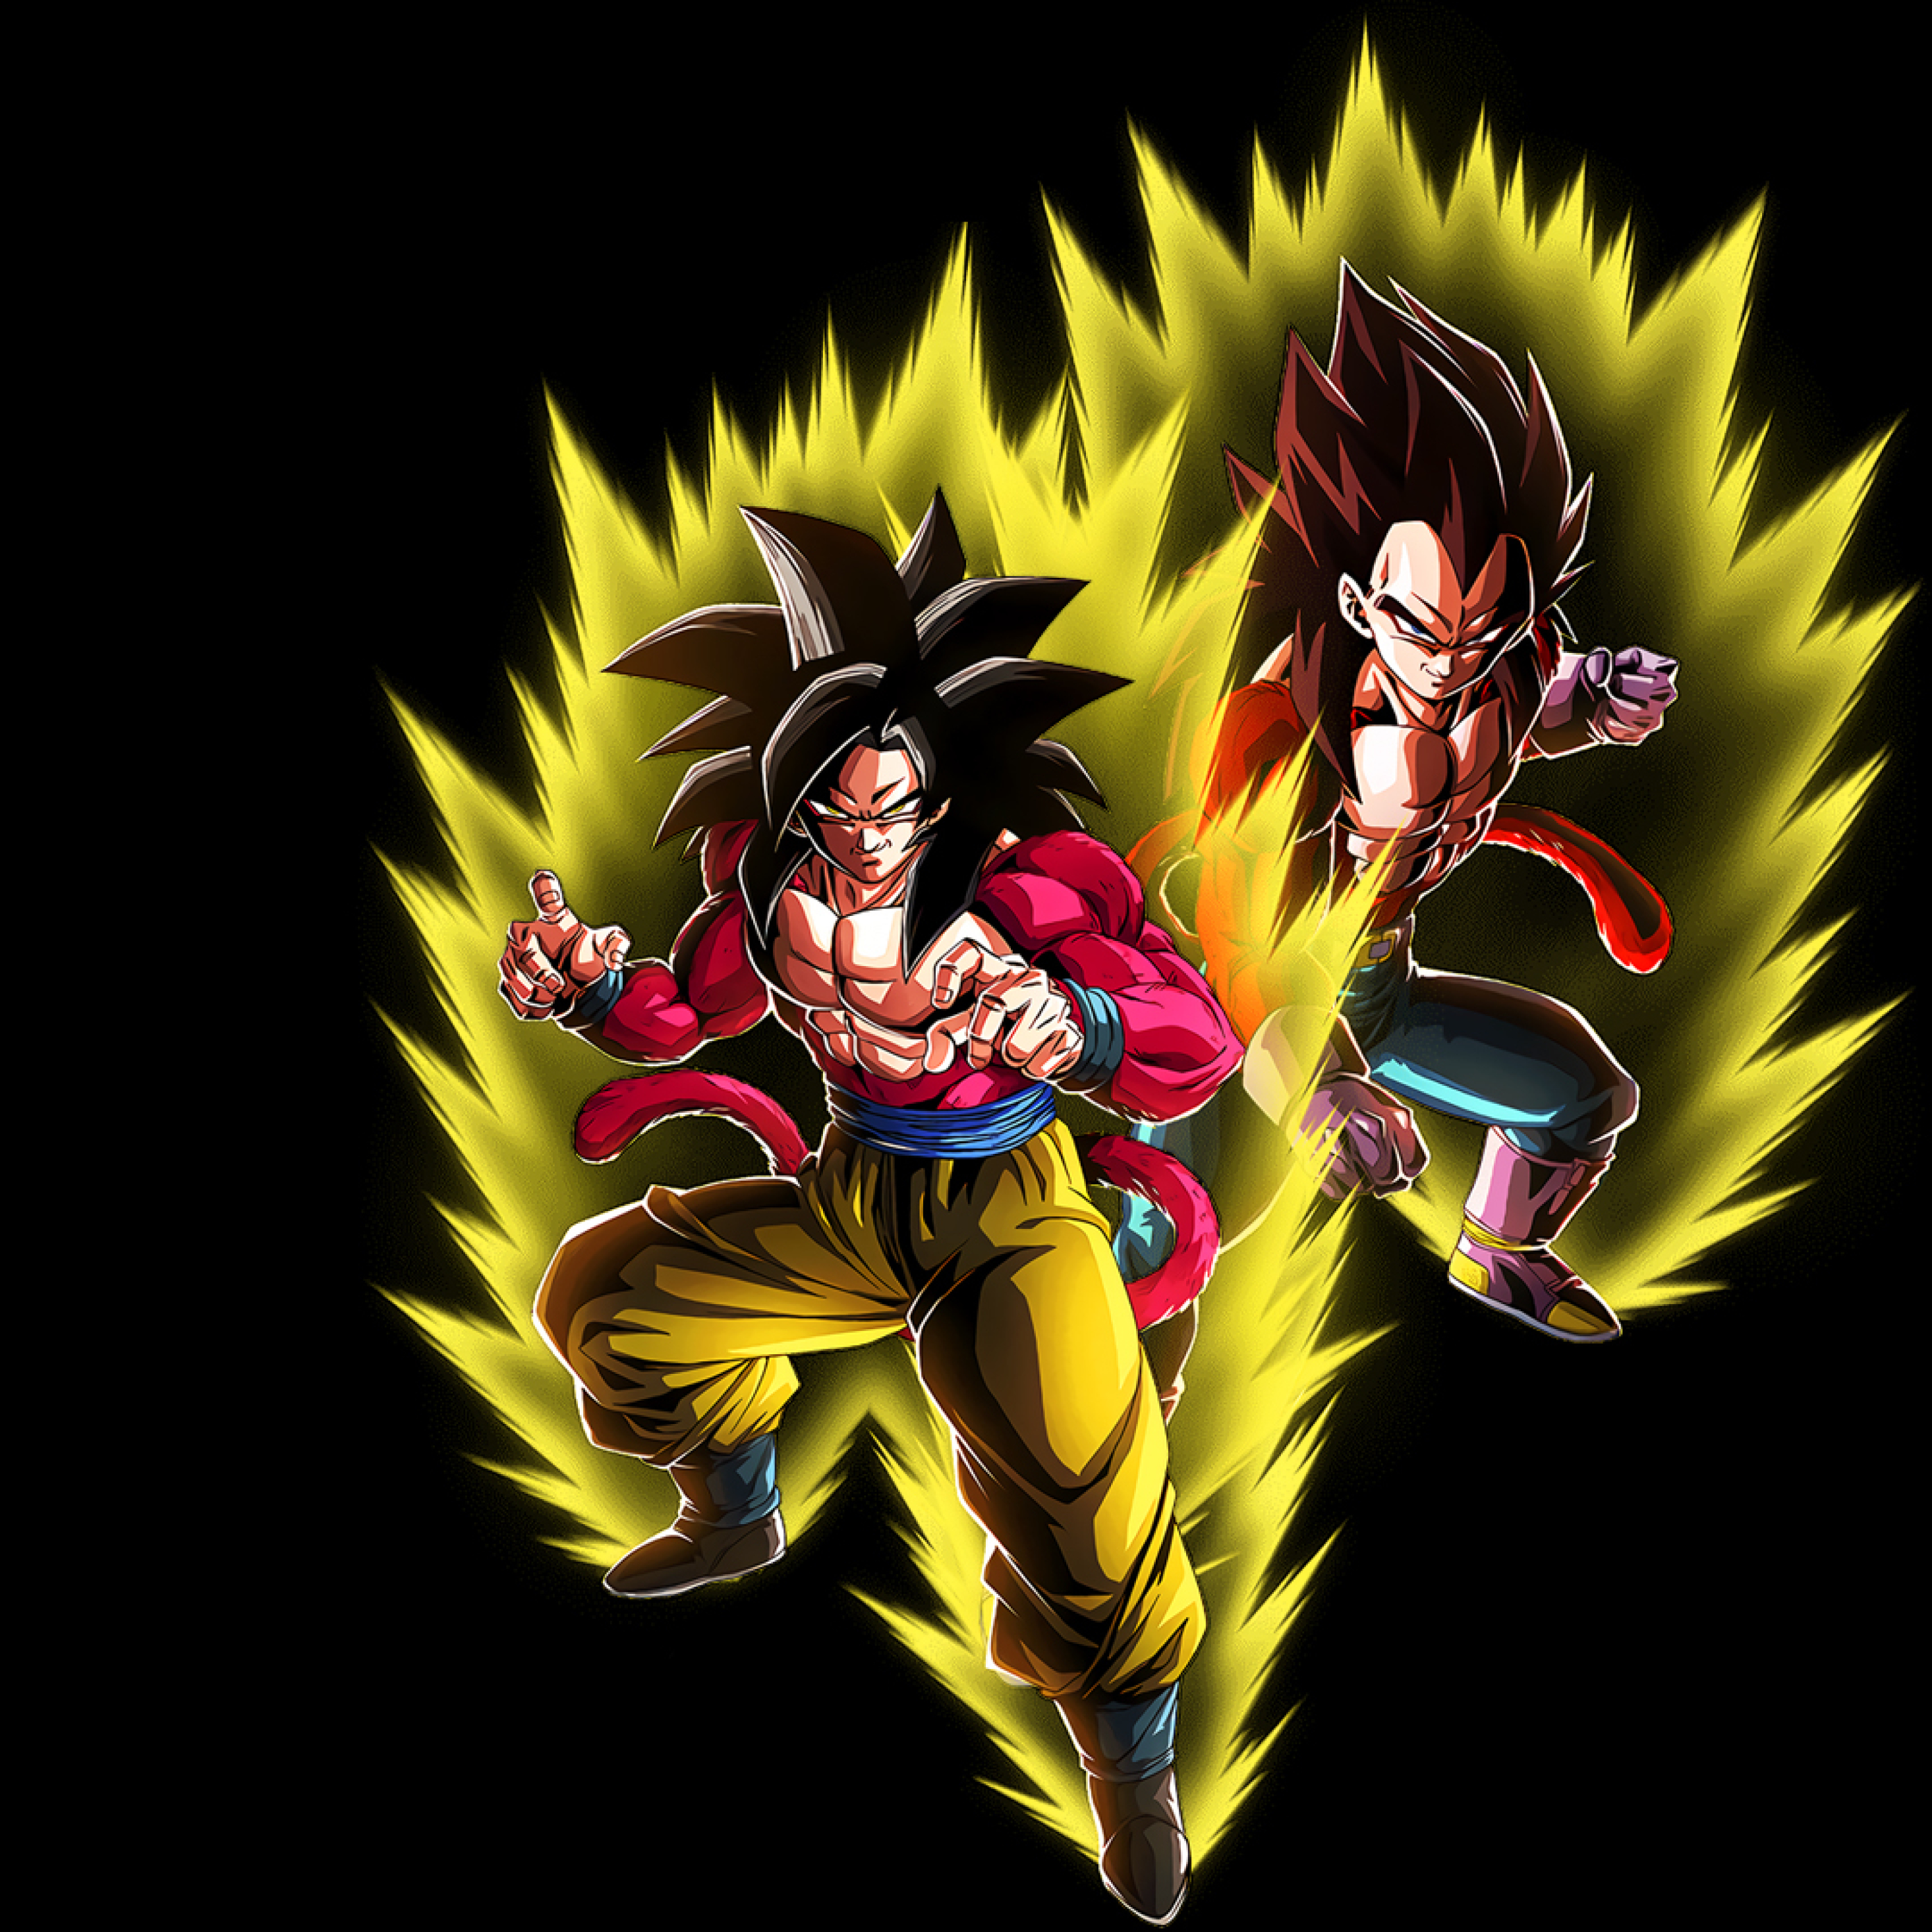 Goku Ssj4 Wallpaper 4k - HD Wallpaper